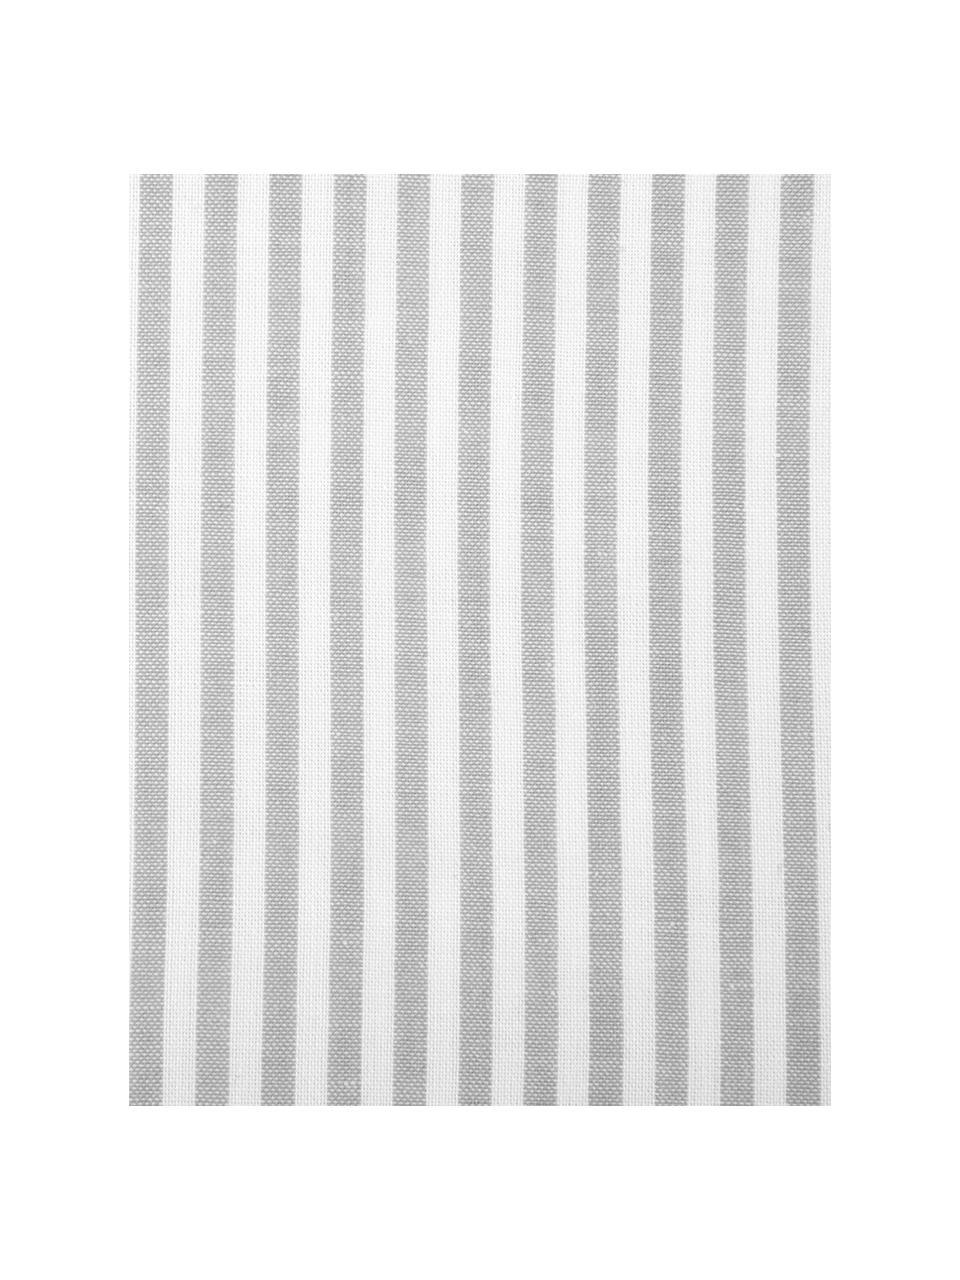 Parure copripiumino in cotone ranforce Ellie, Bianco, grigio, 155 x 200 cm